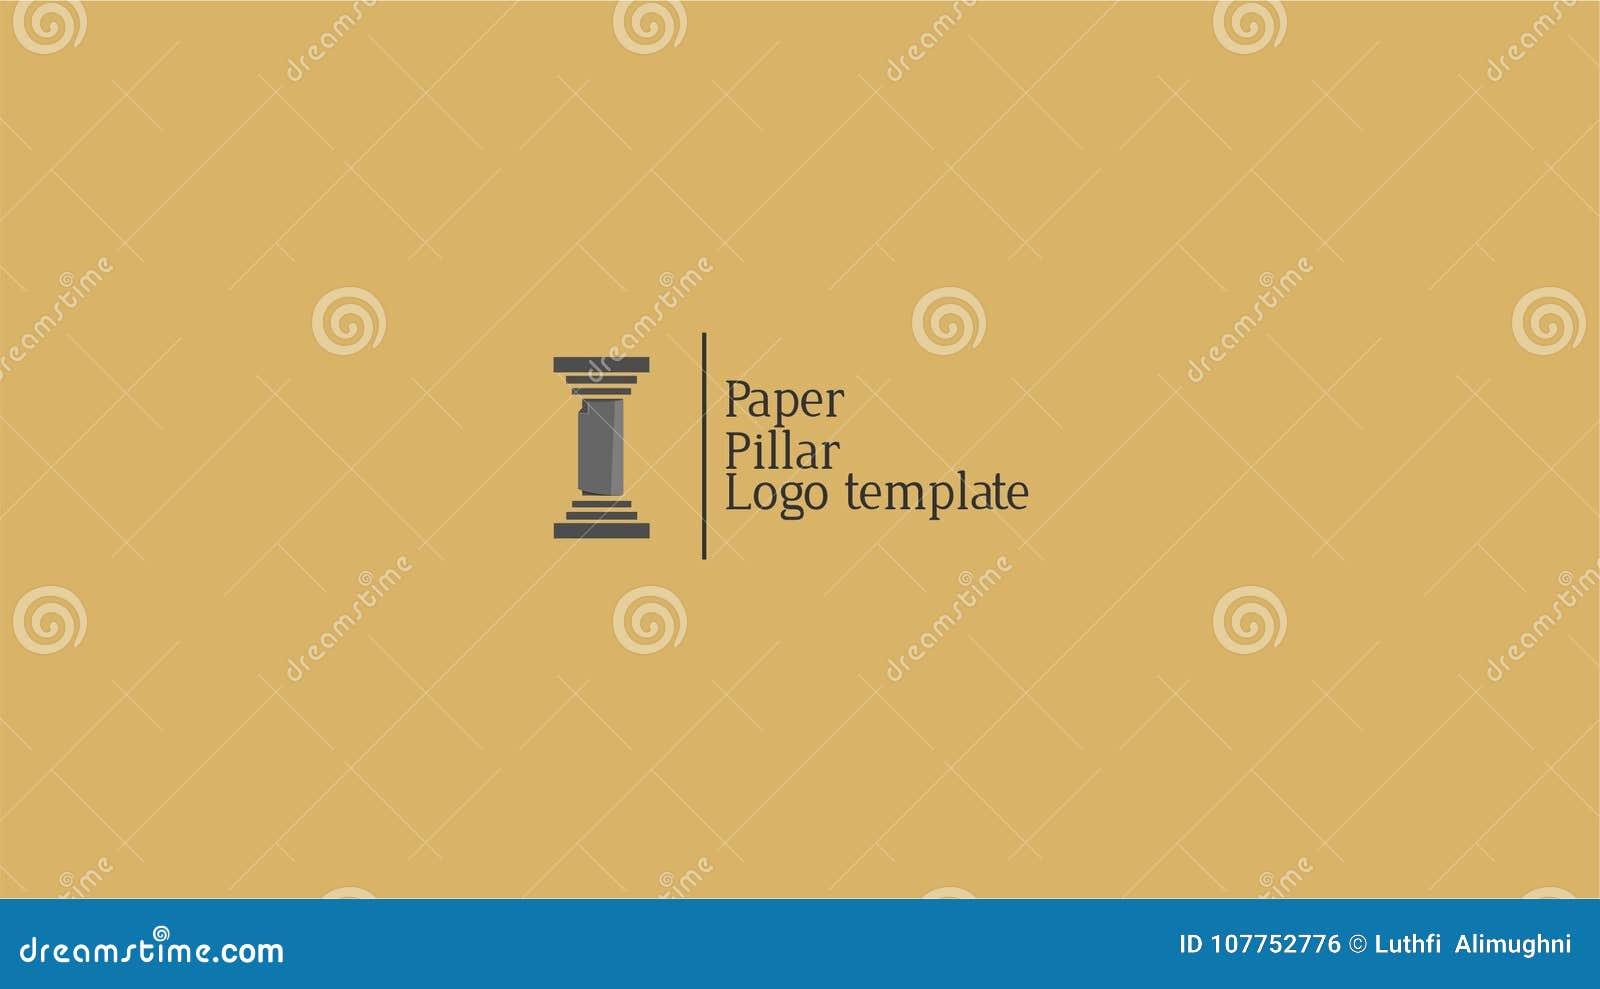 Paper pillar for news logo template stock vector illustration of download paper pillar for news logo template stock vector illustration of logotemplate pillar maxwellsz